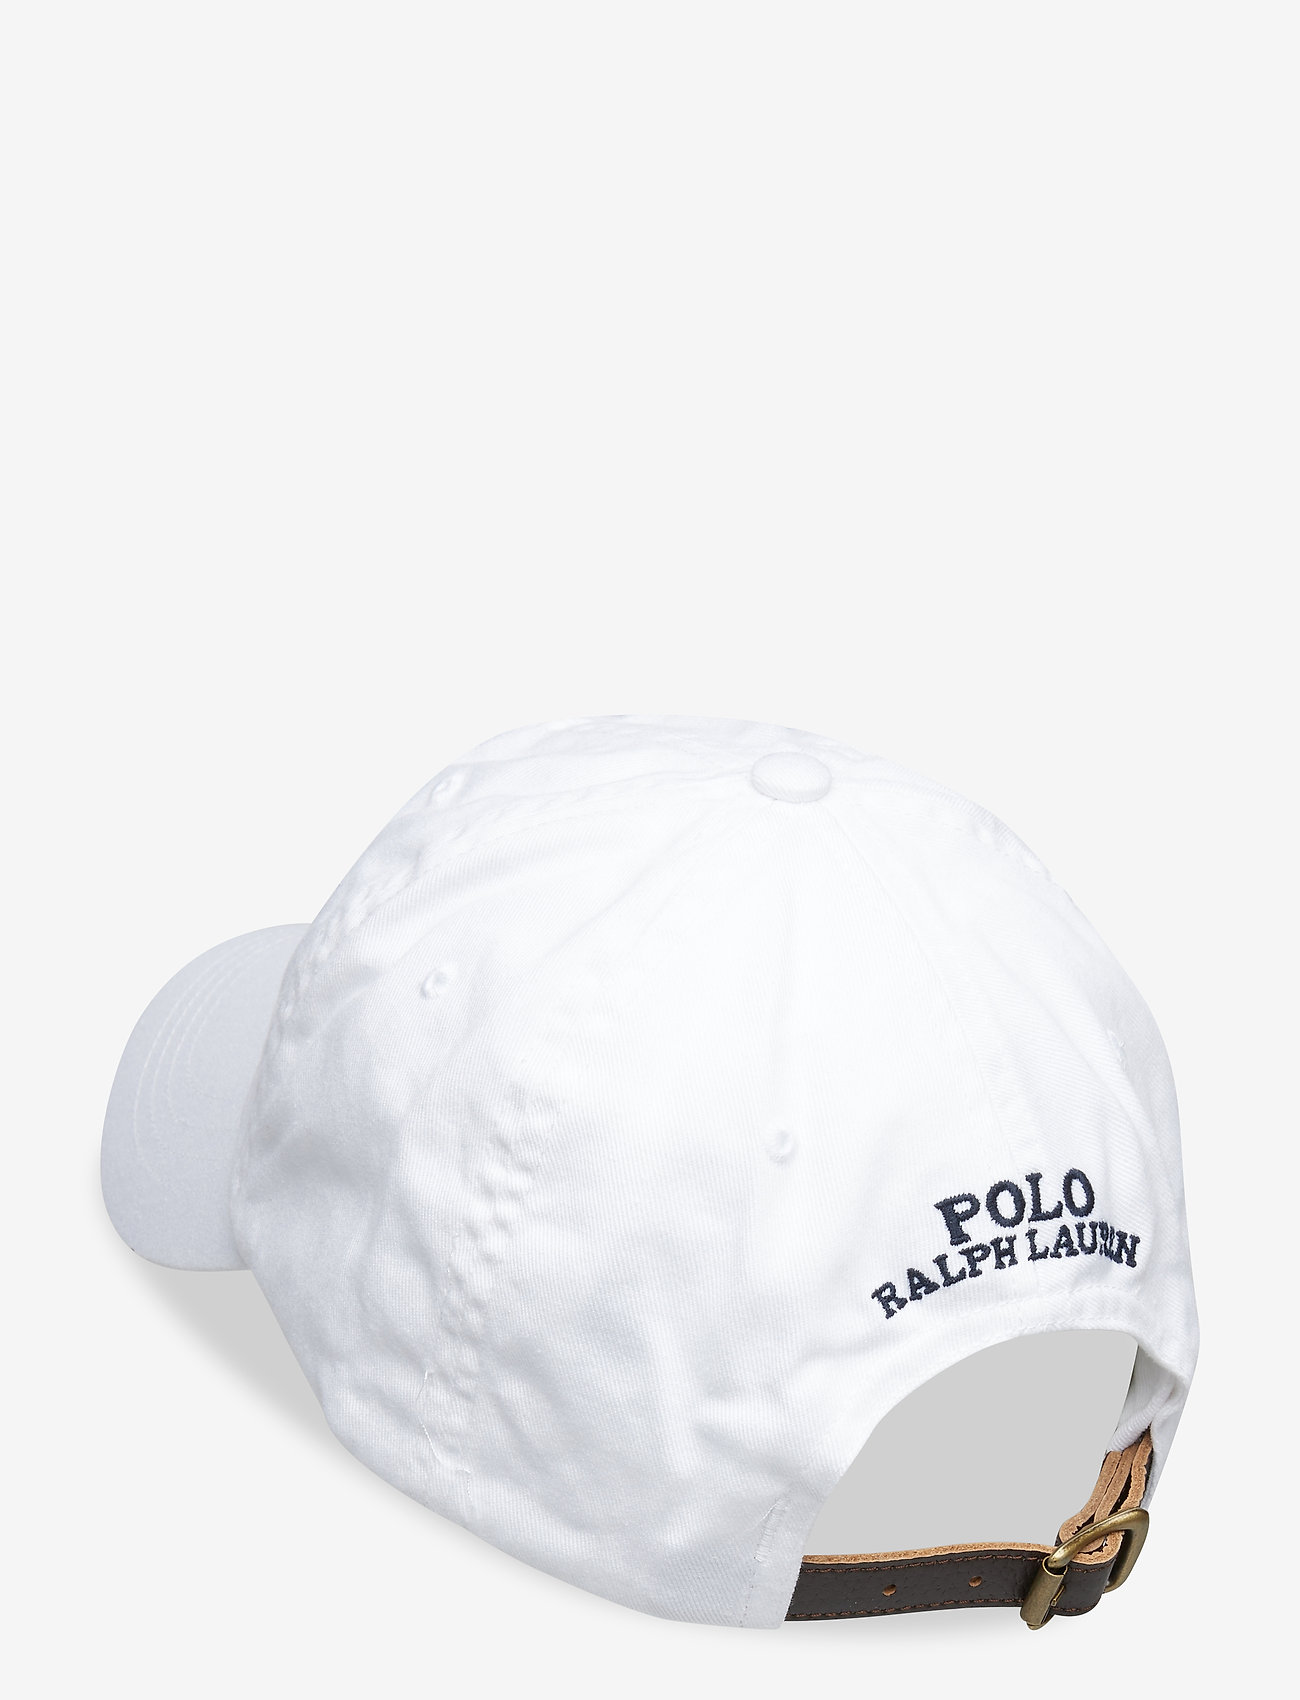 Polo Ralph Lauren CLASSIC SPORT CAP W/ BEAR - Czapki i kapelusze WHITE - Akcesoria